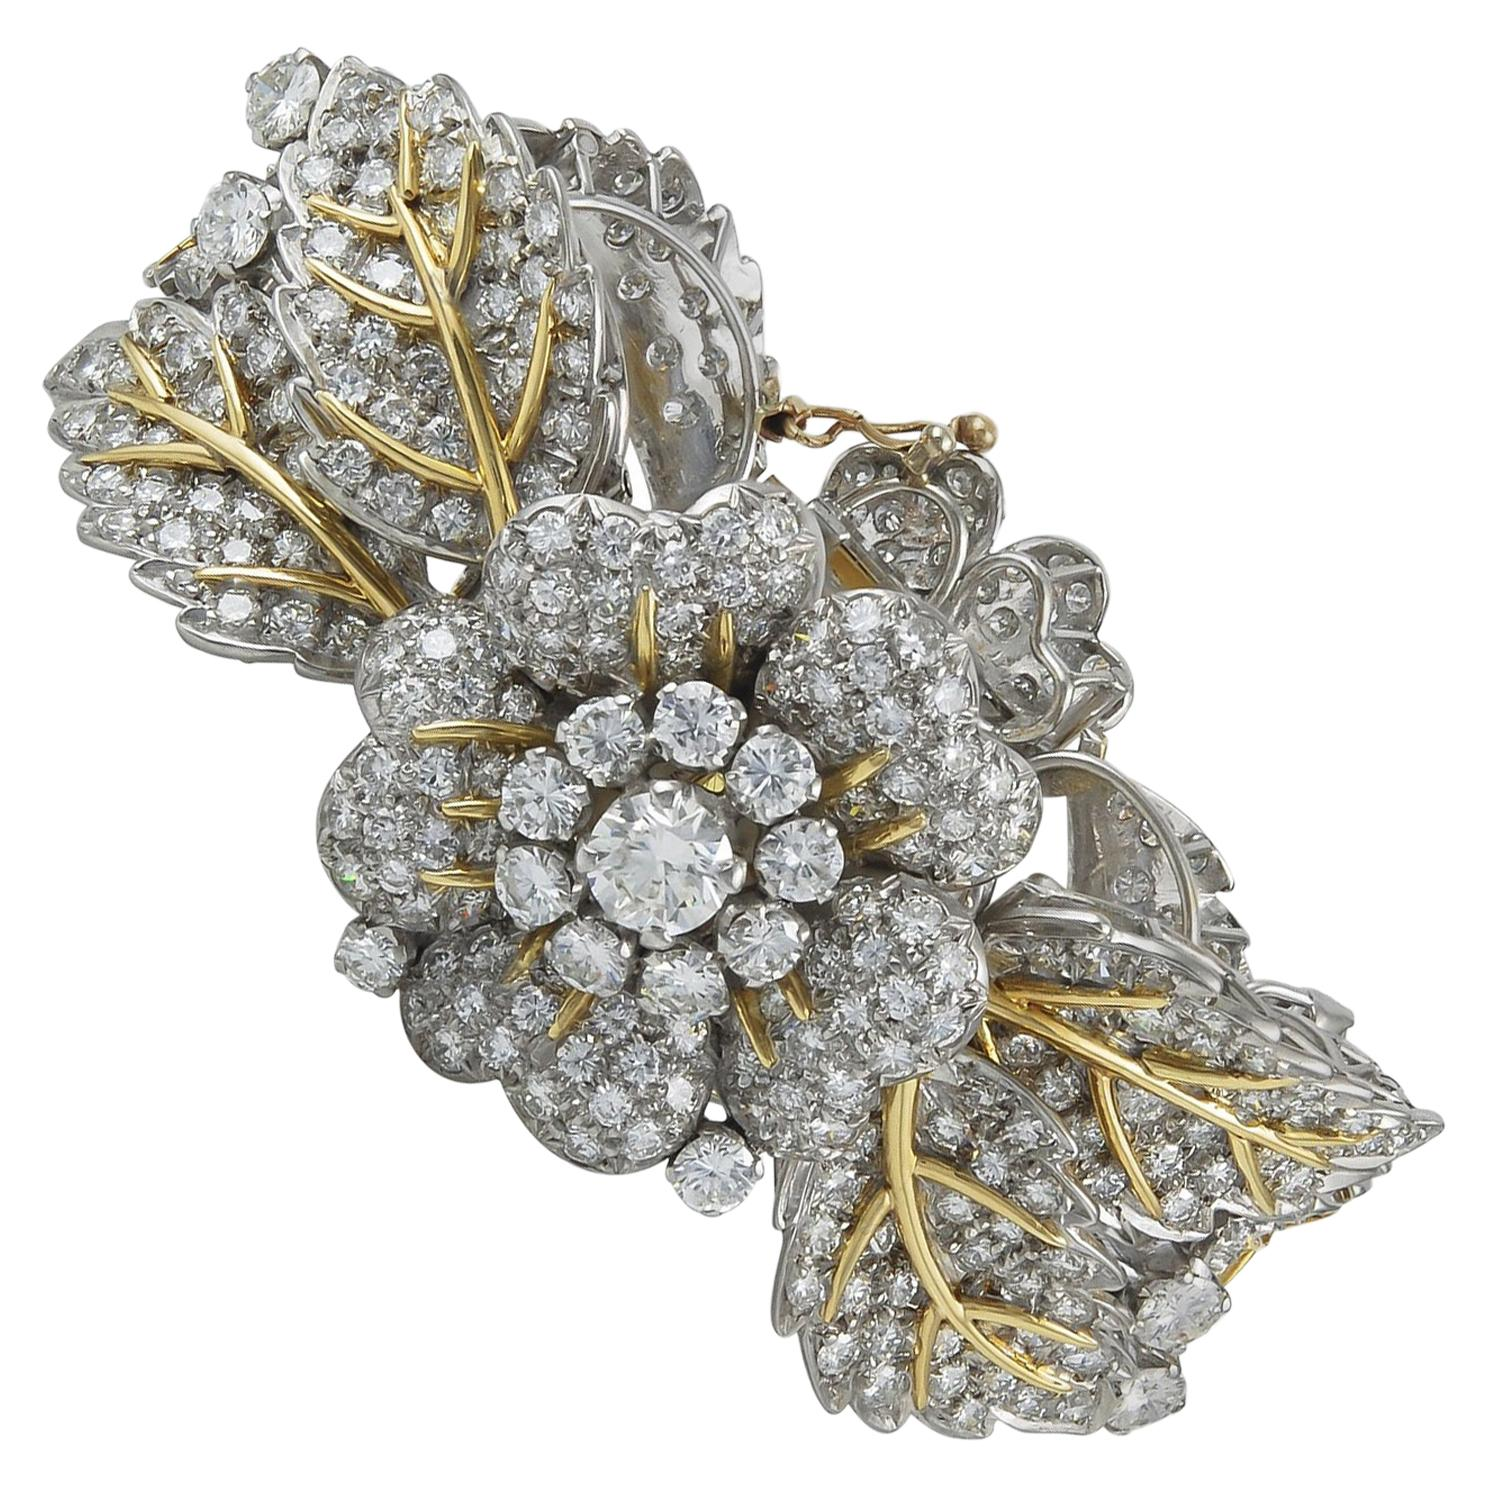 Longines Diamond Garland Convertible Watch Bracelet